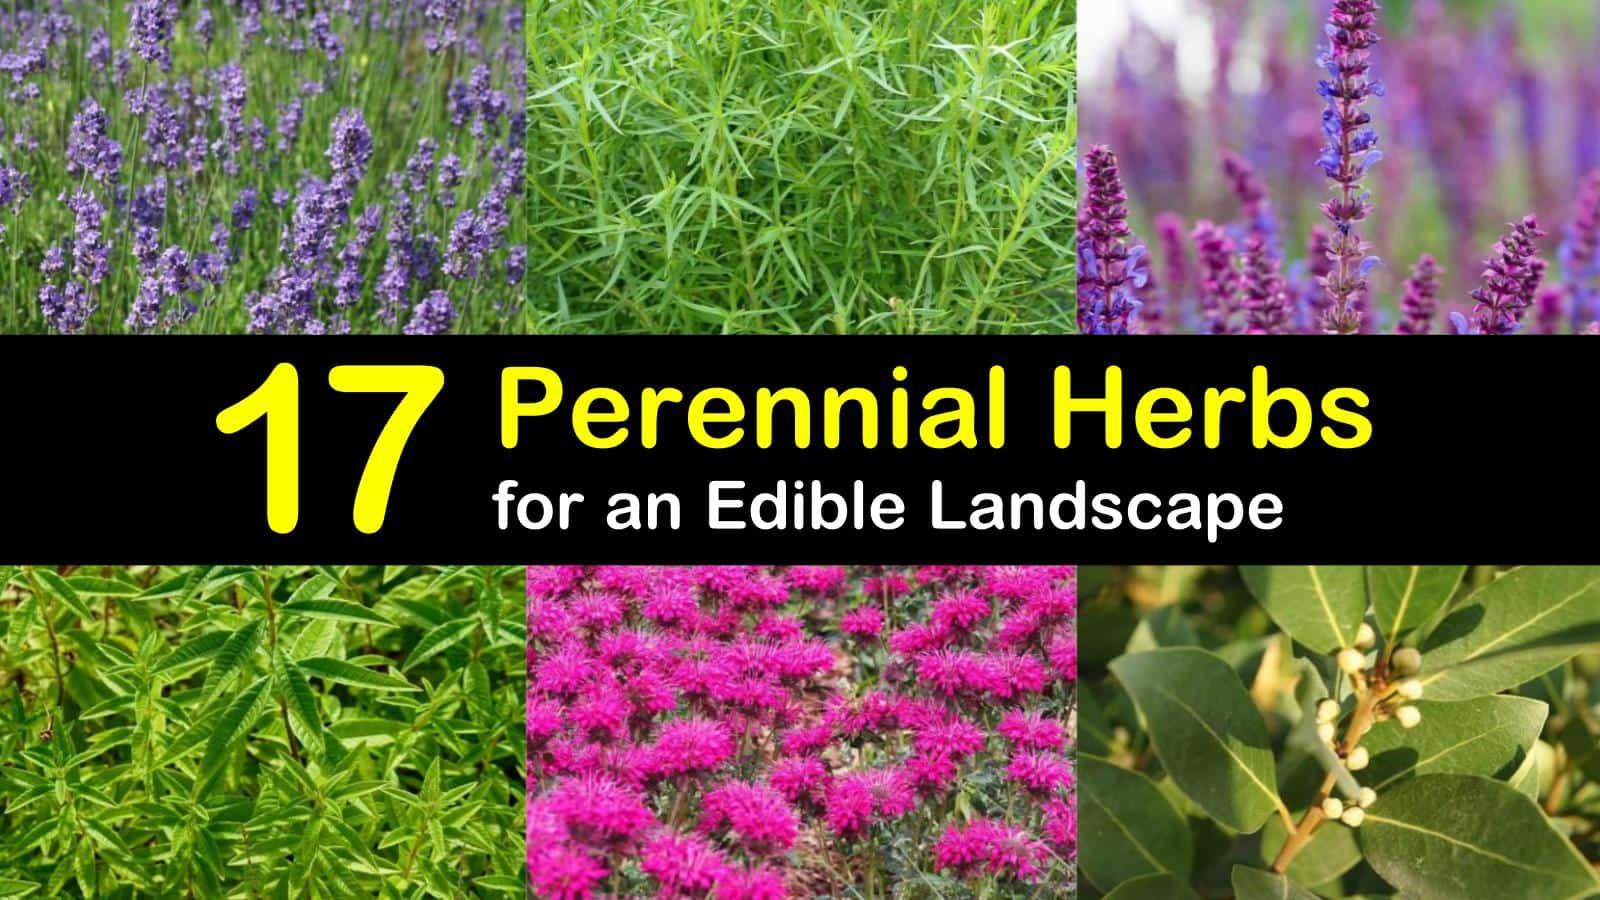 perennial herbs titleimg1